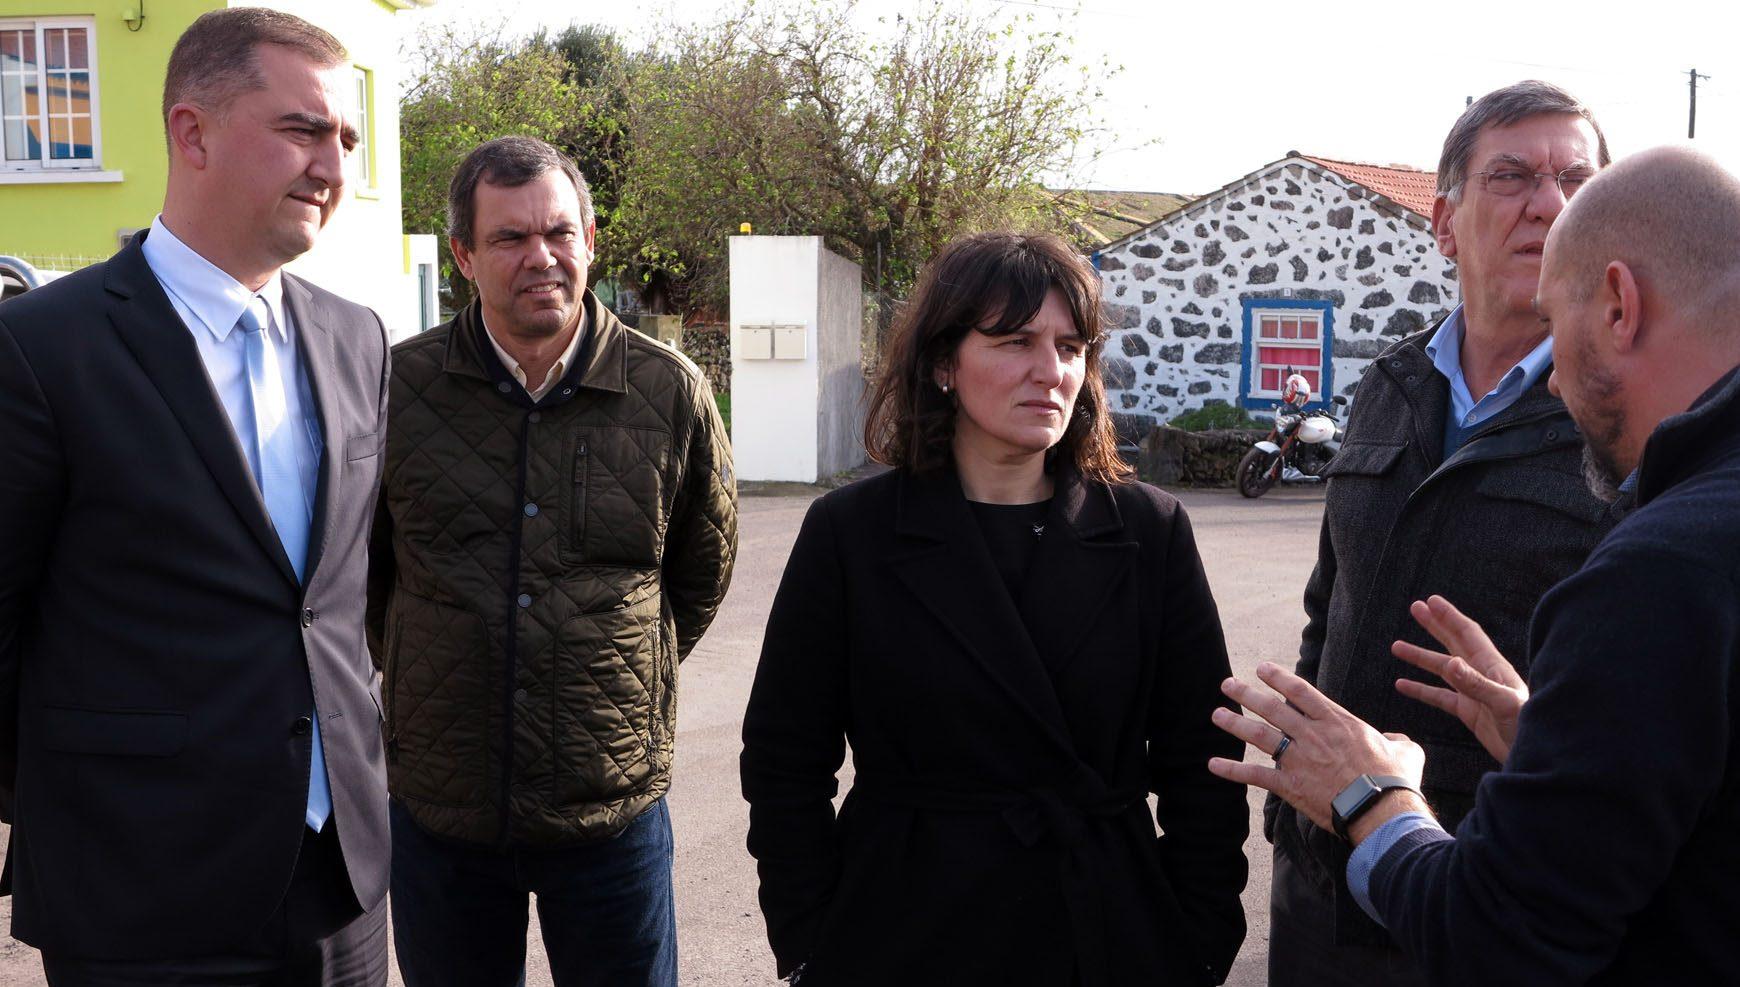 Reabilitação da estrada entre o Aeroporto e a Ribeira do Almeida concluída no primeiro semestre, assegura Ana Cunha